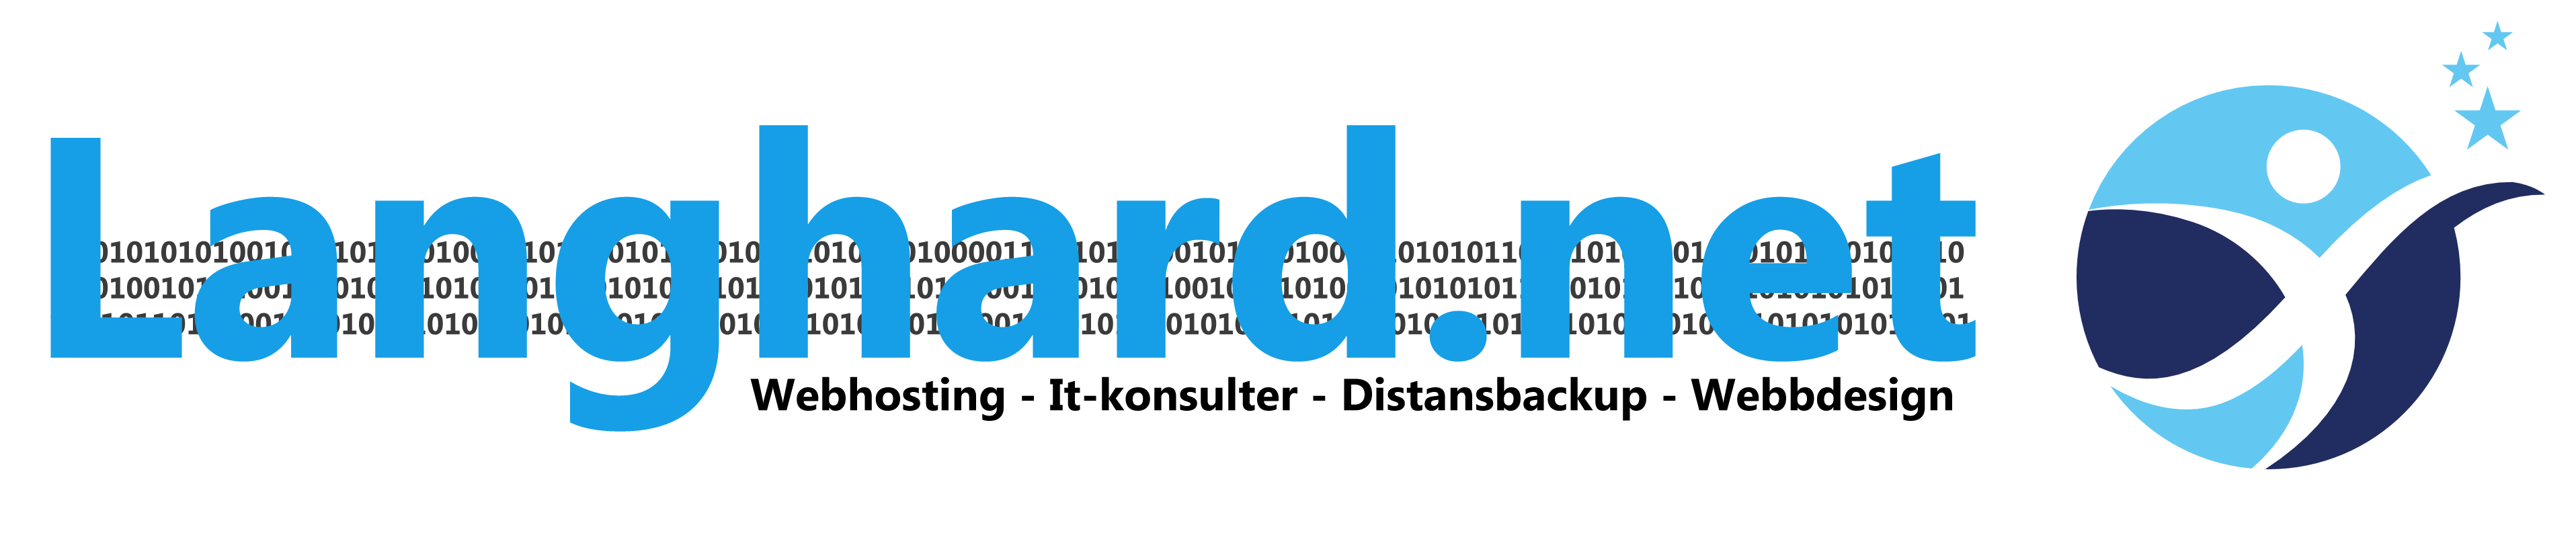 Langhard.net